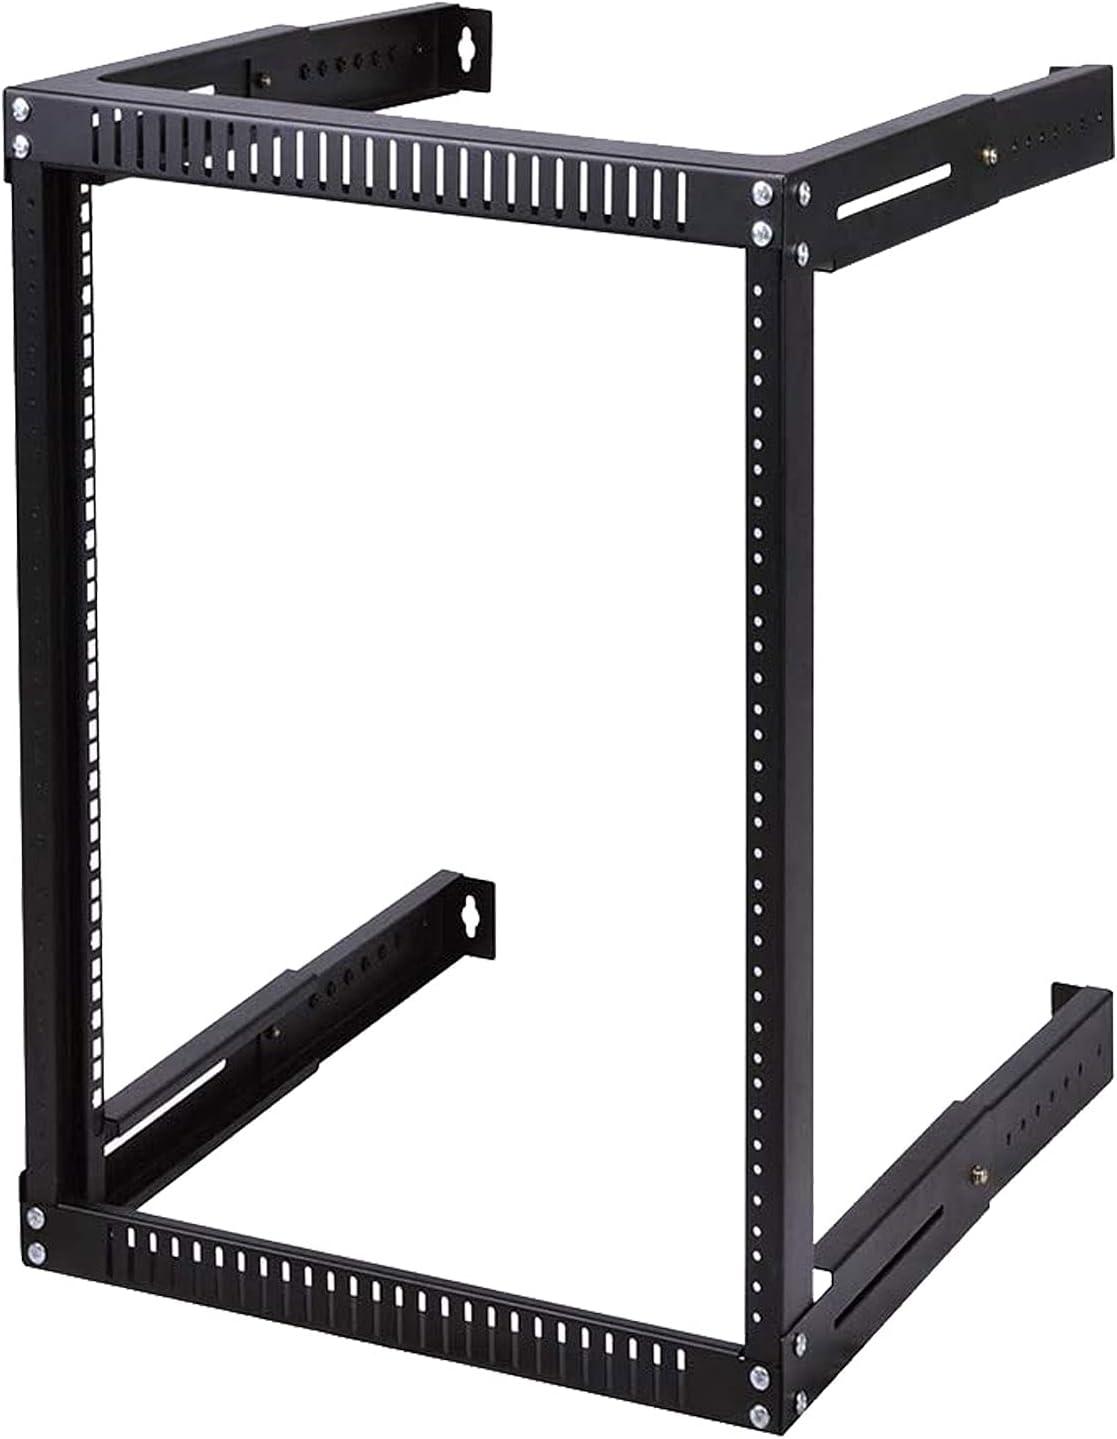 FerruNet18U Blank Rack Mount Panel Spacer for 19-Inch Server Network Rack Enclosure Or Cabinet Black,ApplytoSmall Office, Home Office.